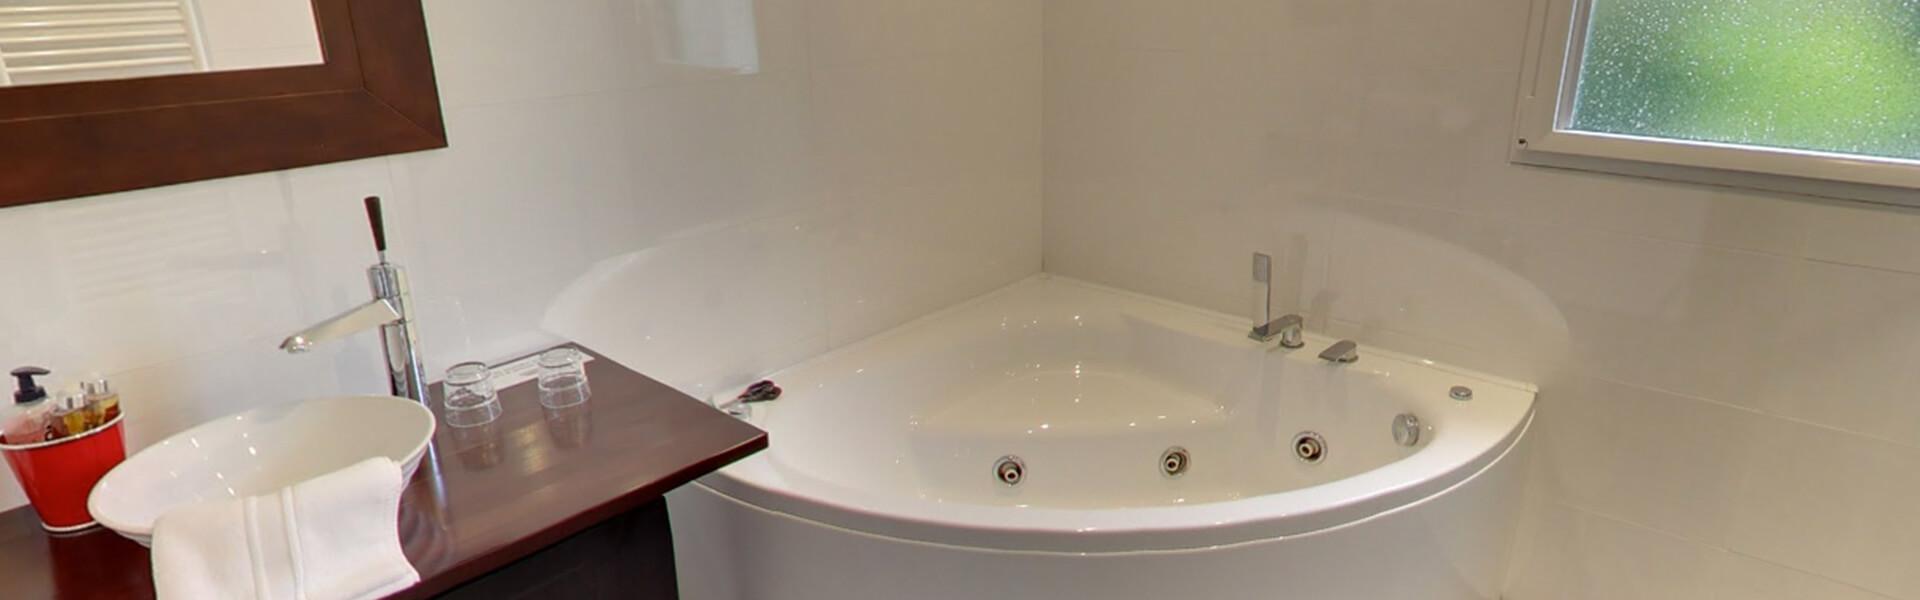 chambre d 39 h te thalasso avec bain baln o jacuzzi vannes morbihan. Black Bedroom Furniture Sets. Home Design Ideas